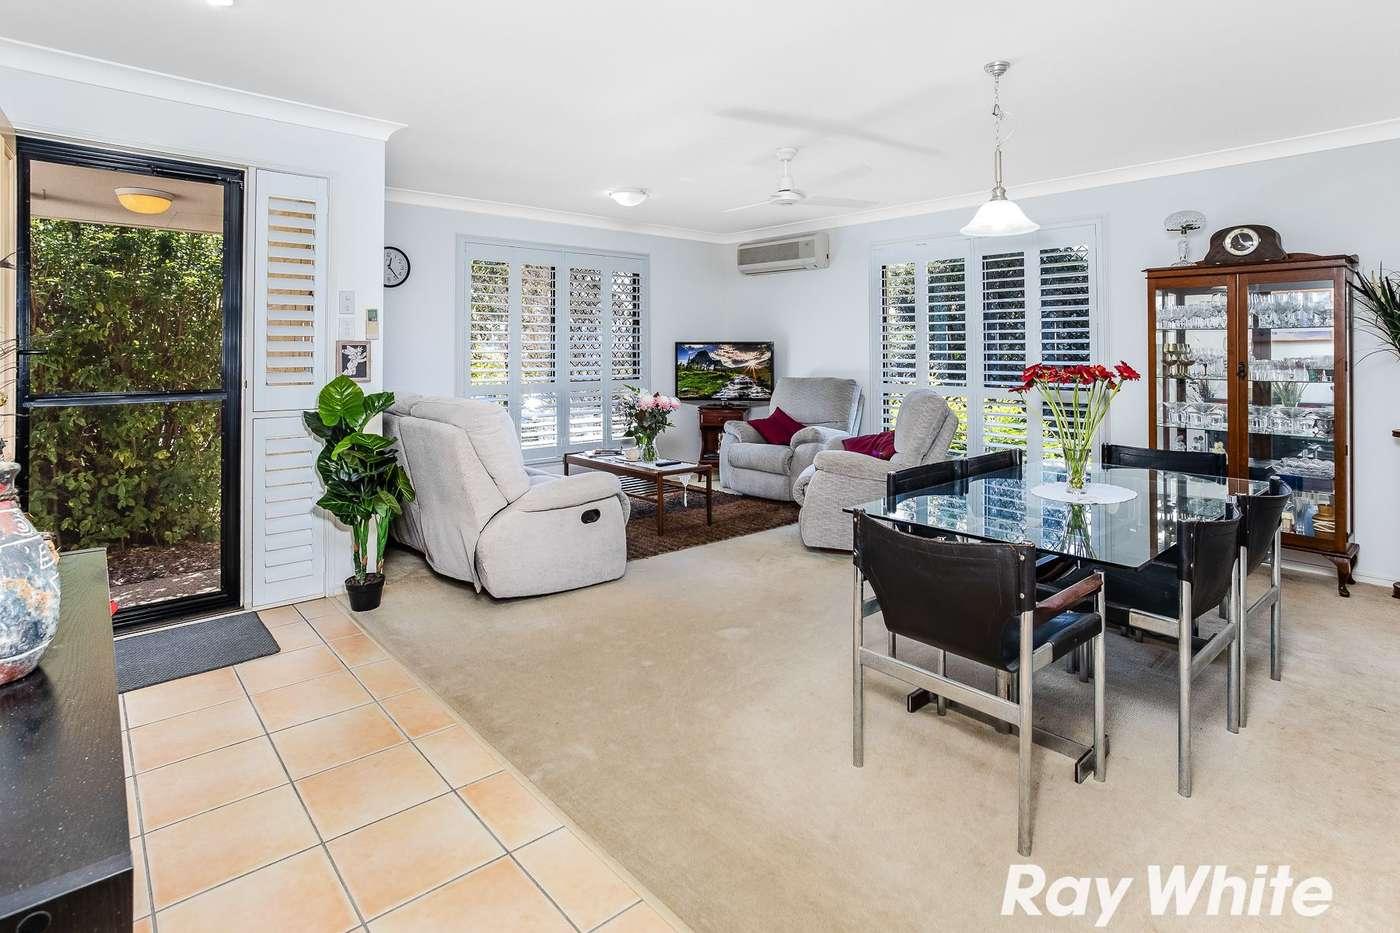 Main view of Homely house listing, 9 Civetta Court, Dakabin, QLD 4503